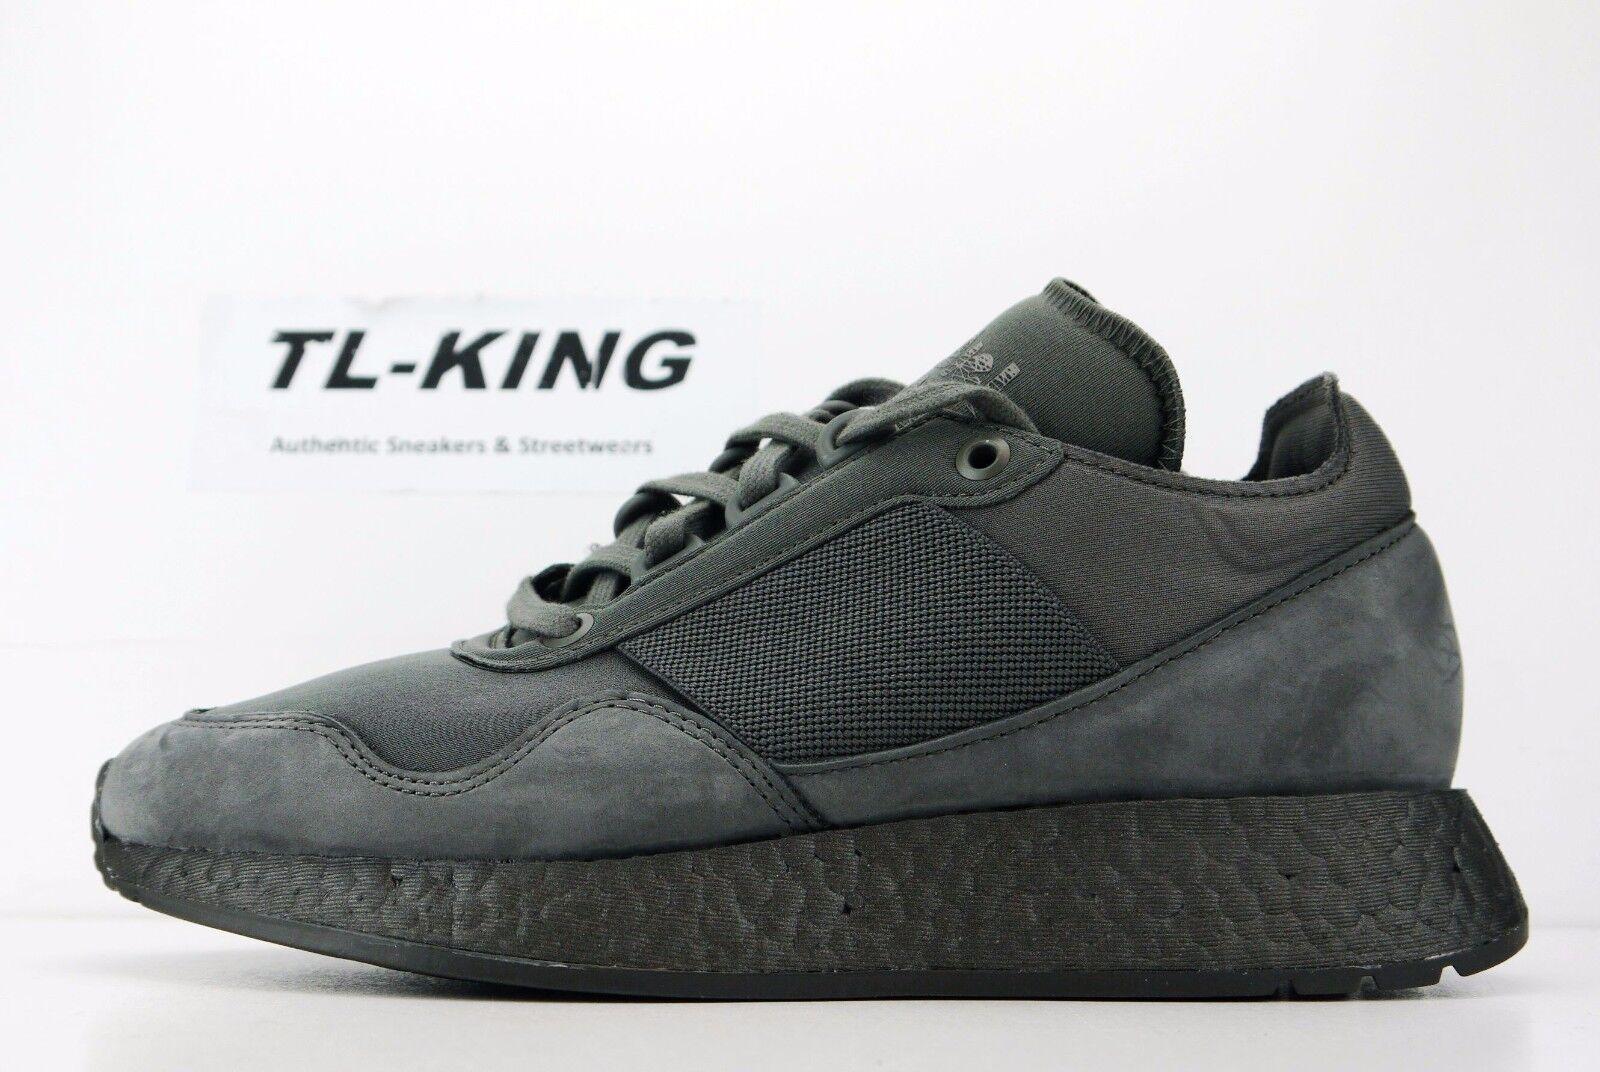 Adidas Originals Daniel Arsham New York Present Dark Grey Black DB1971 Price reduction